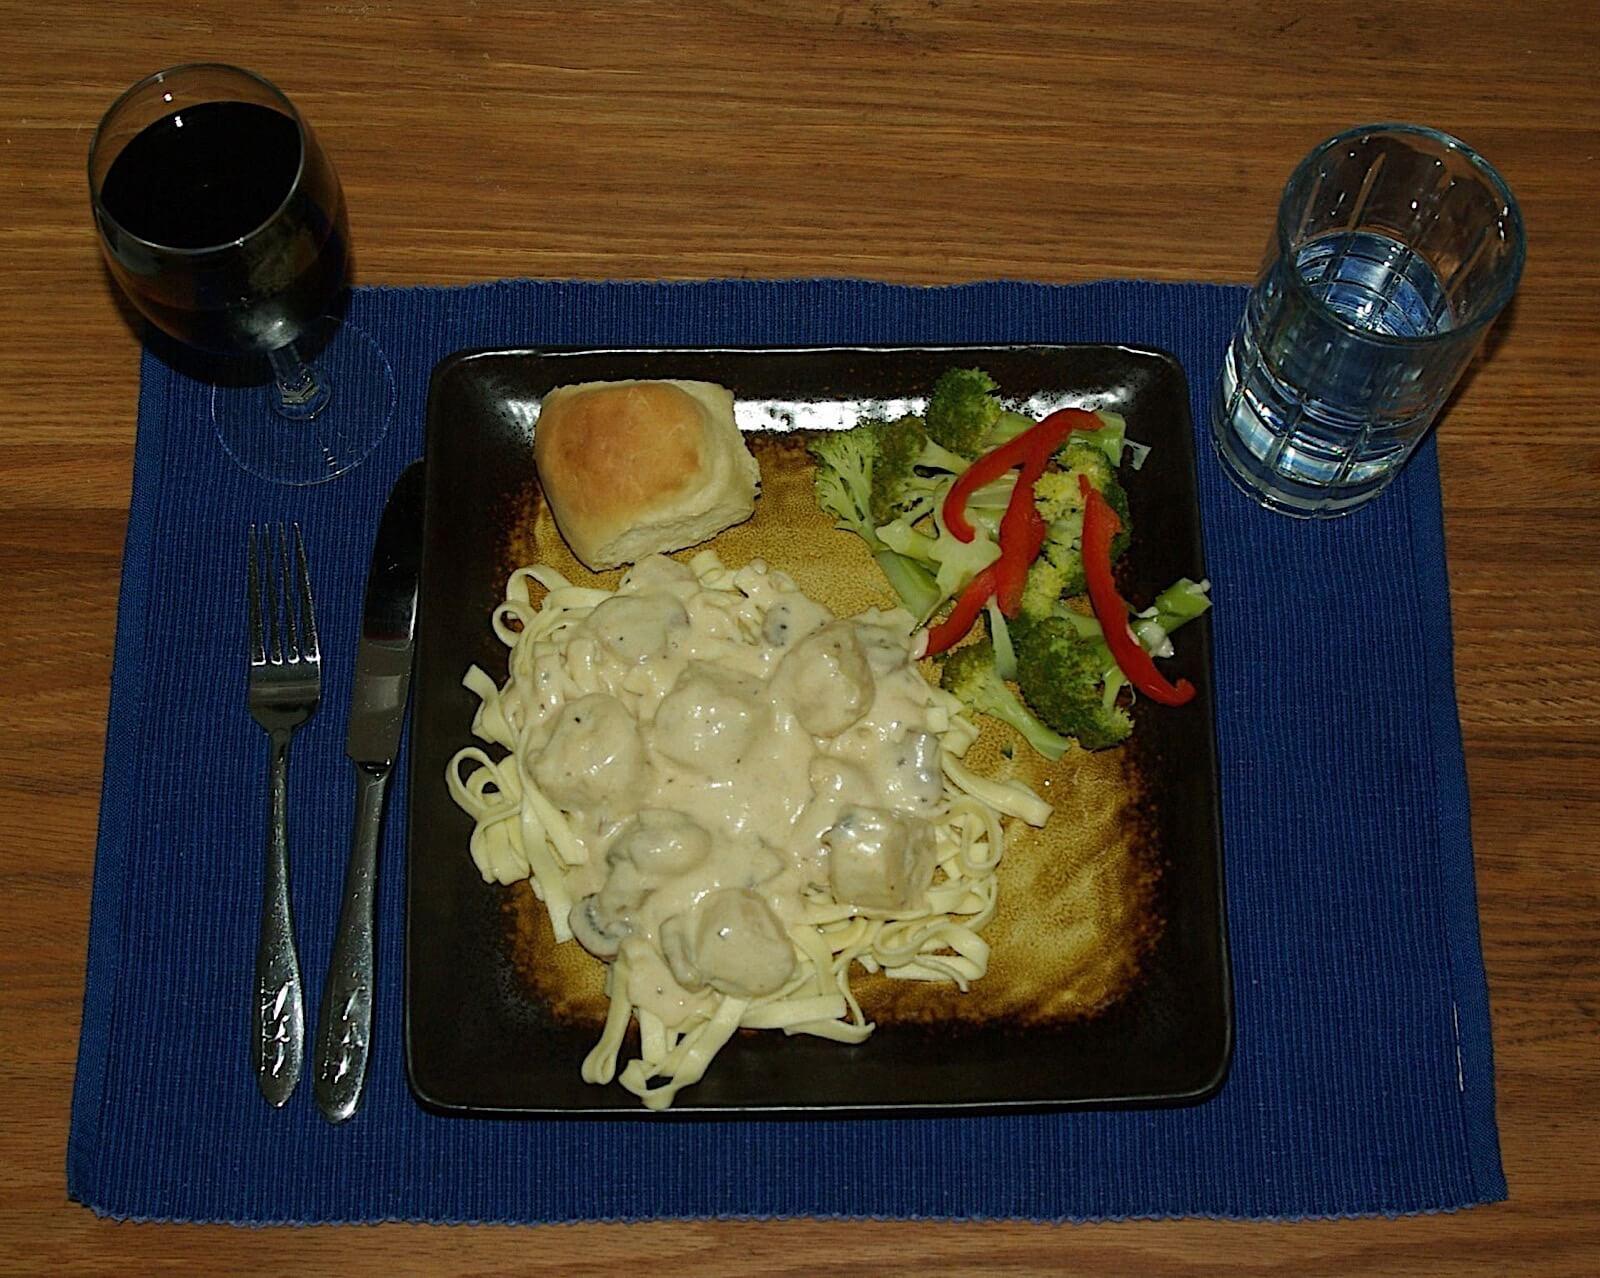 Kodiak Island fishing lodge all inclusive lodge meals in Alaska